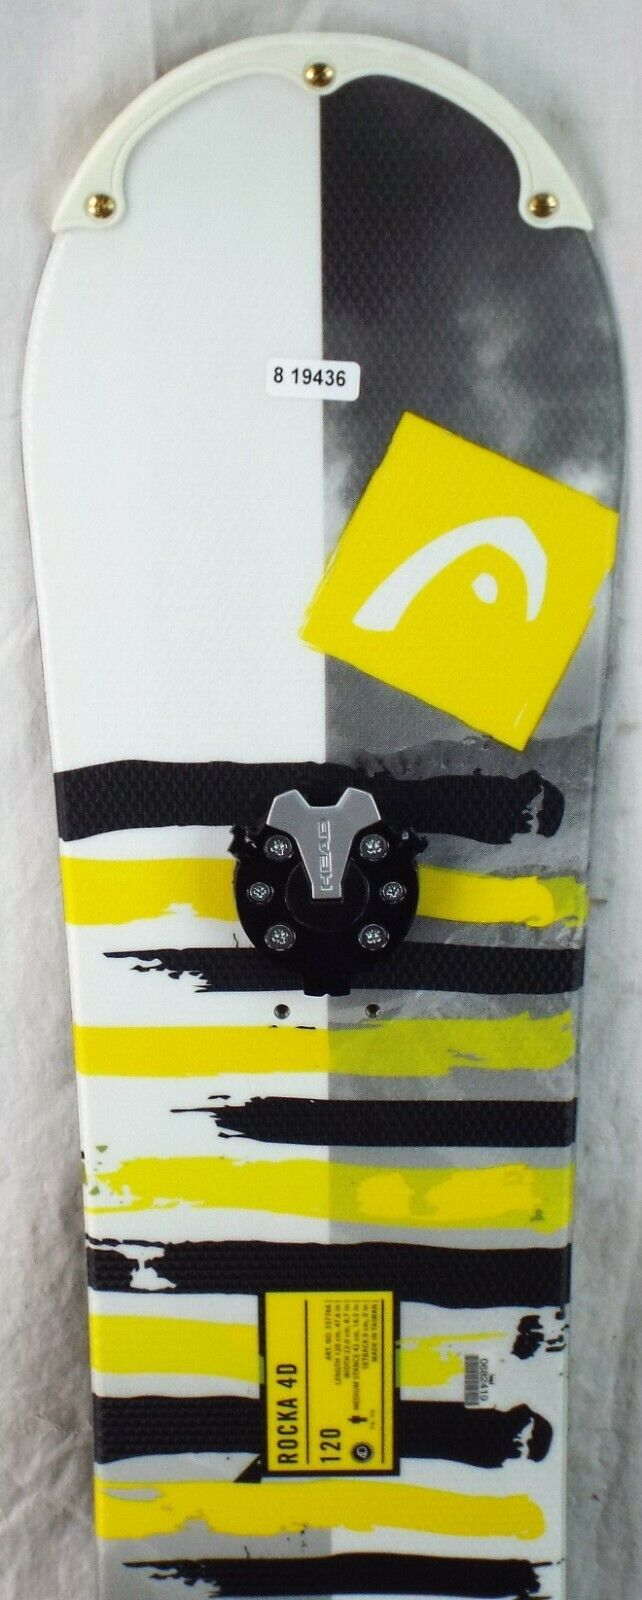 18-19 Head Rocka 4D Gebruikte Junior Demo Snowboard Grootte 120cm \\35;H819436